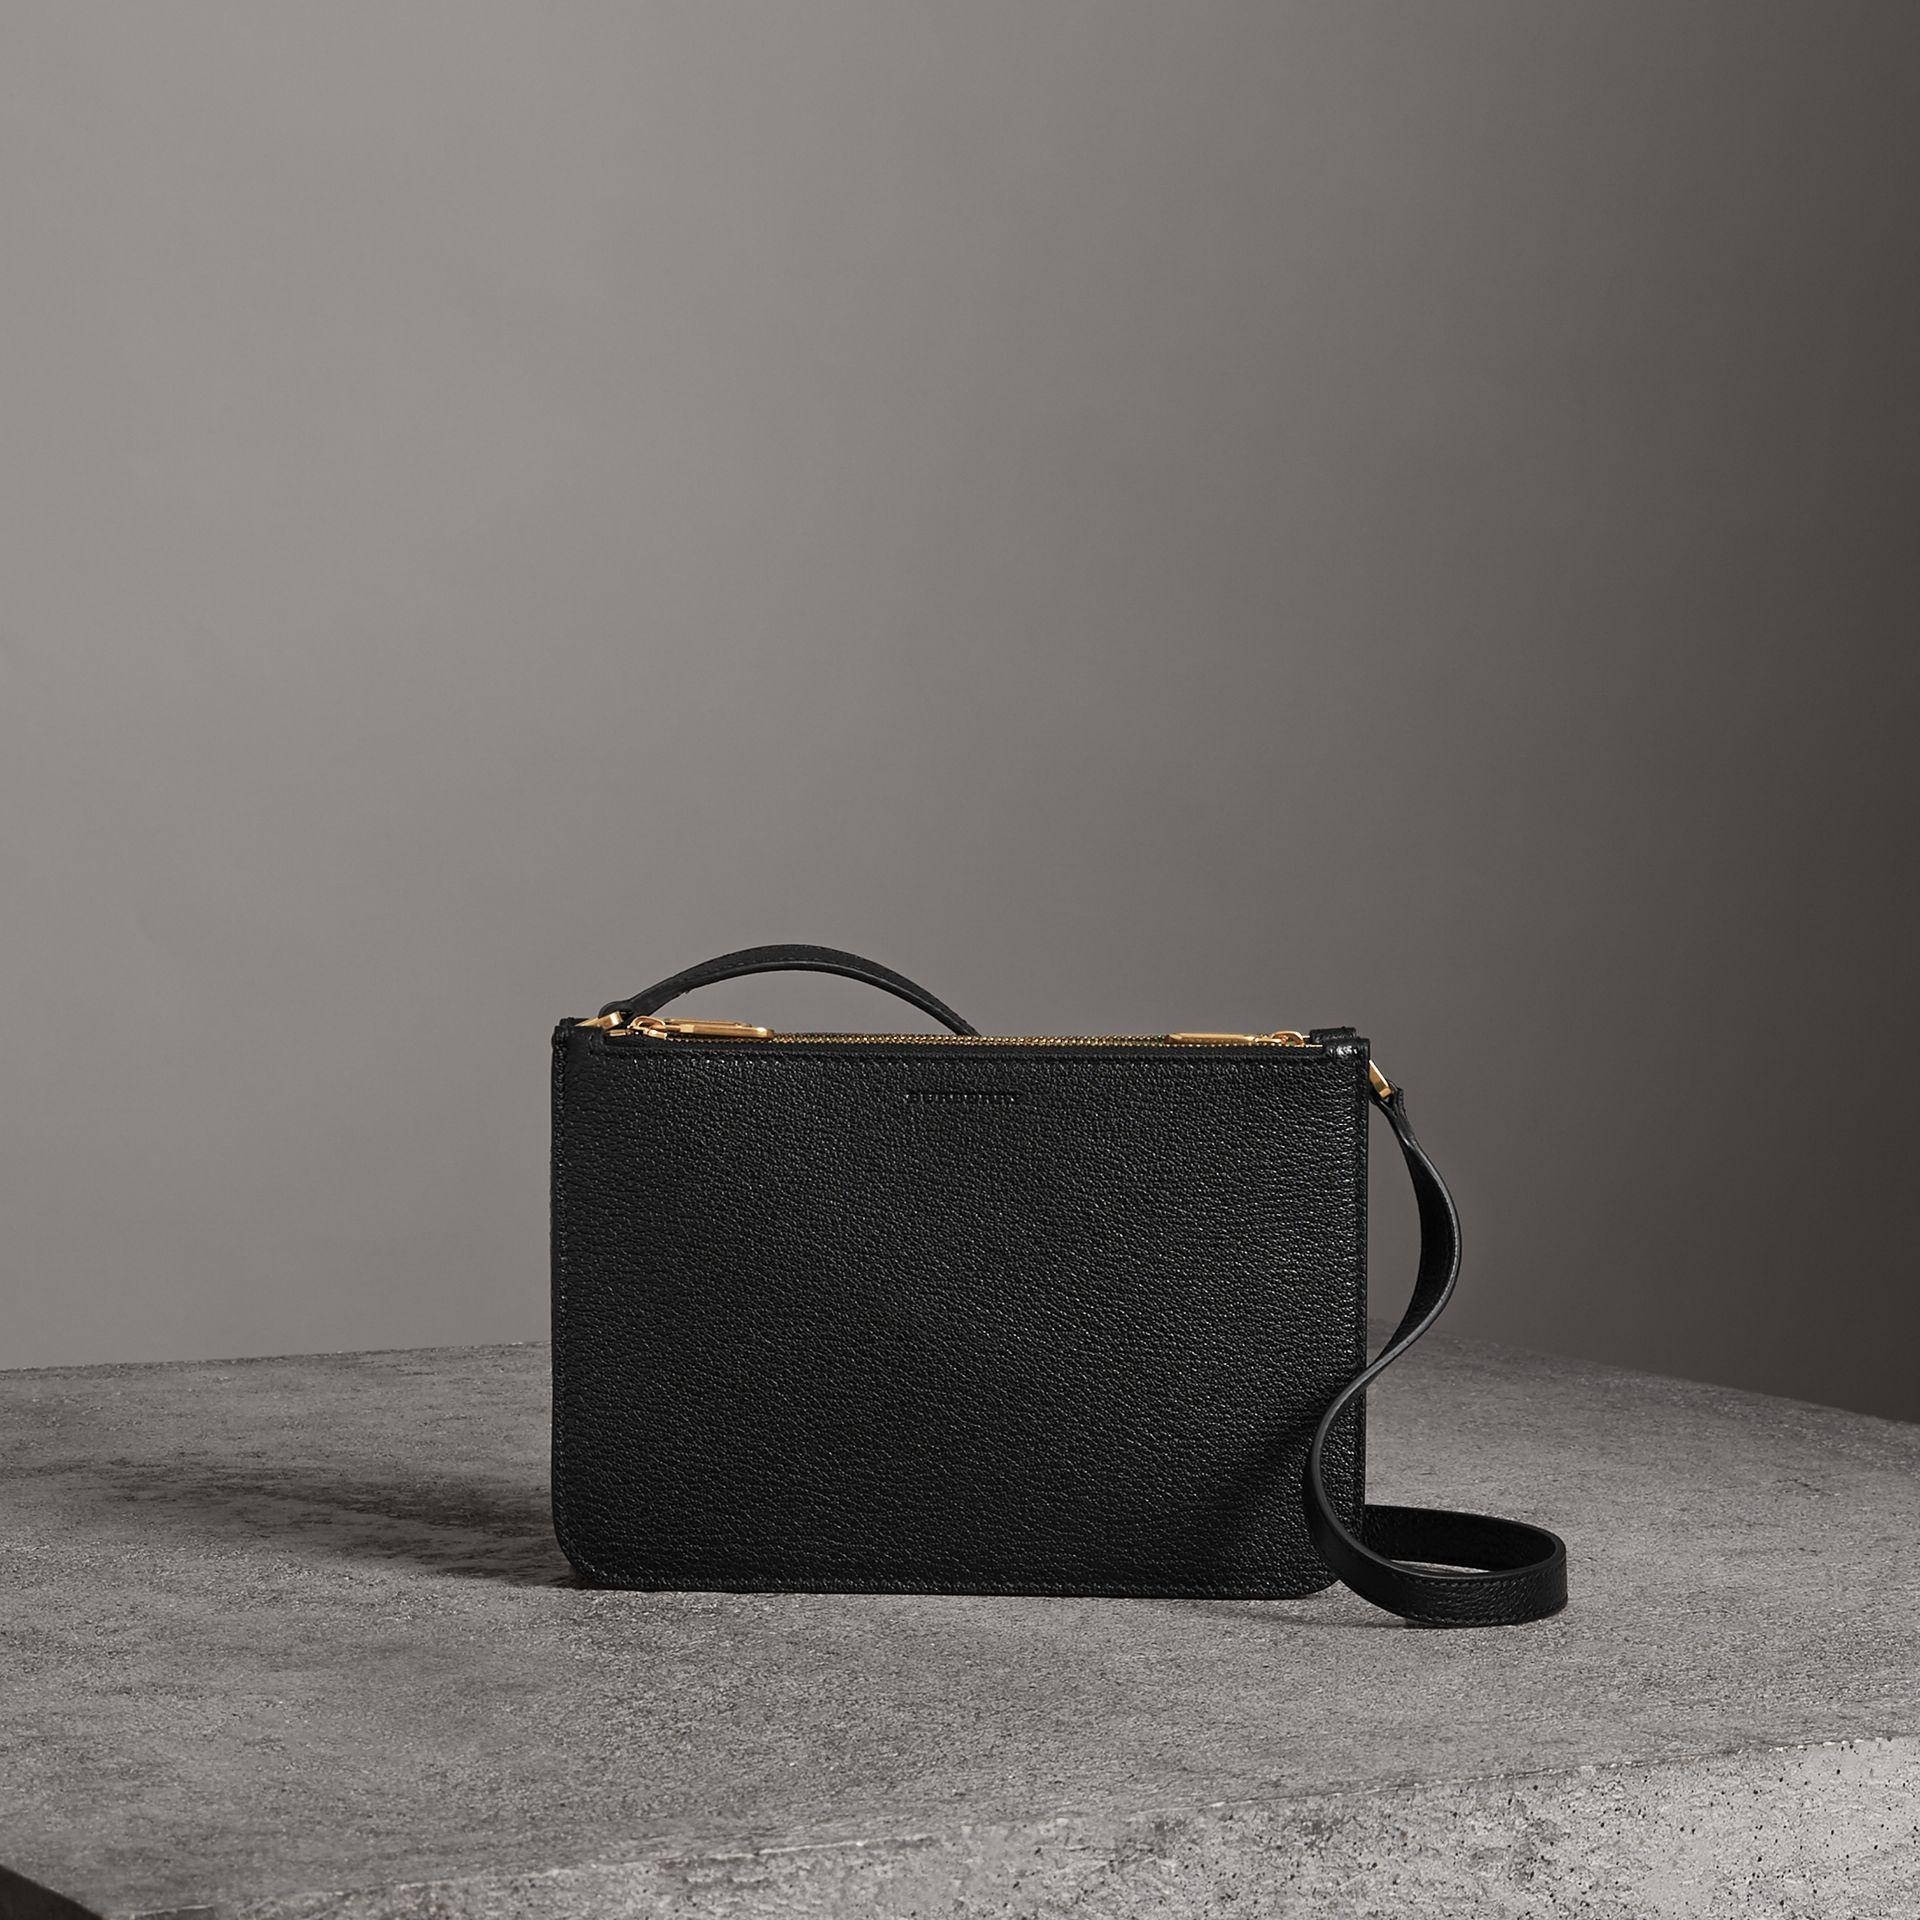 55bfc41d5b4f Burberry Triple Zip Grainy Leather Crossbody Bag In Black Gold ...